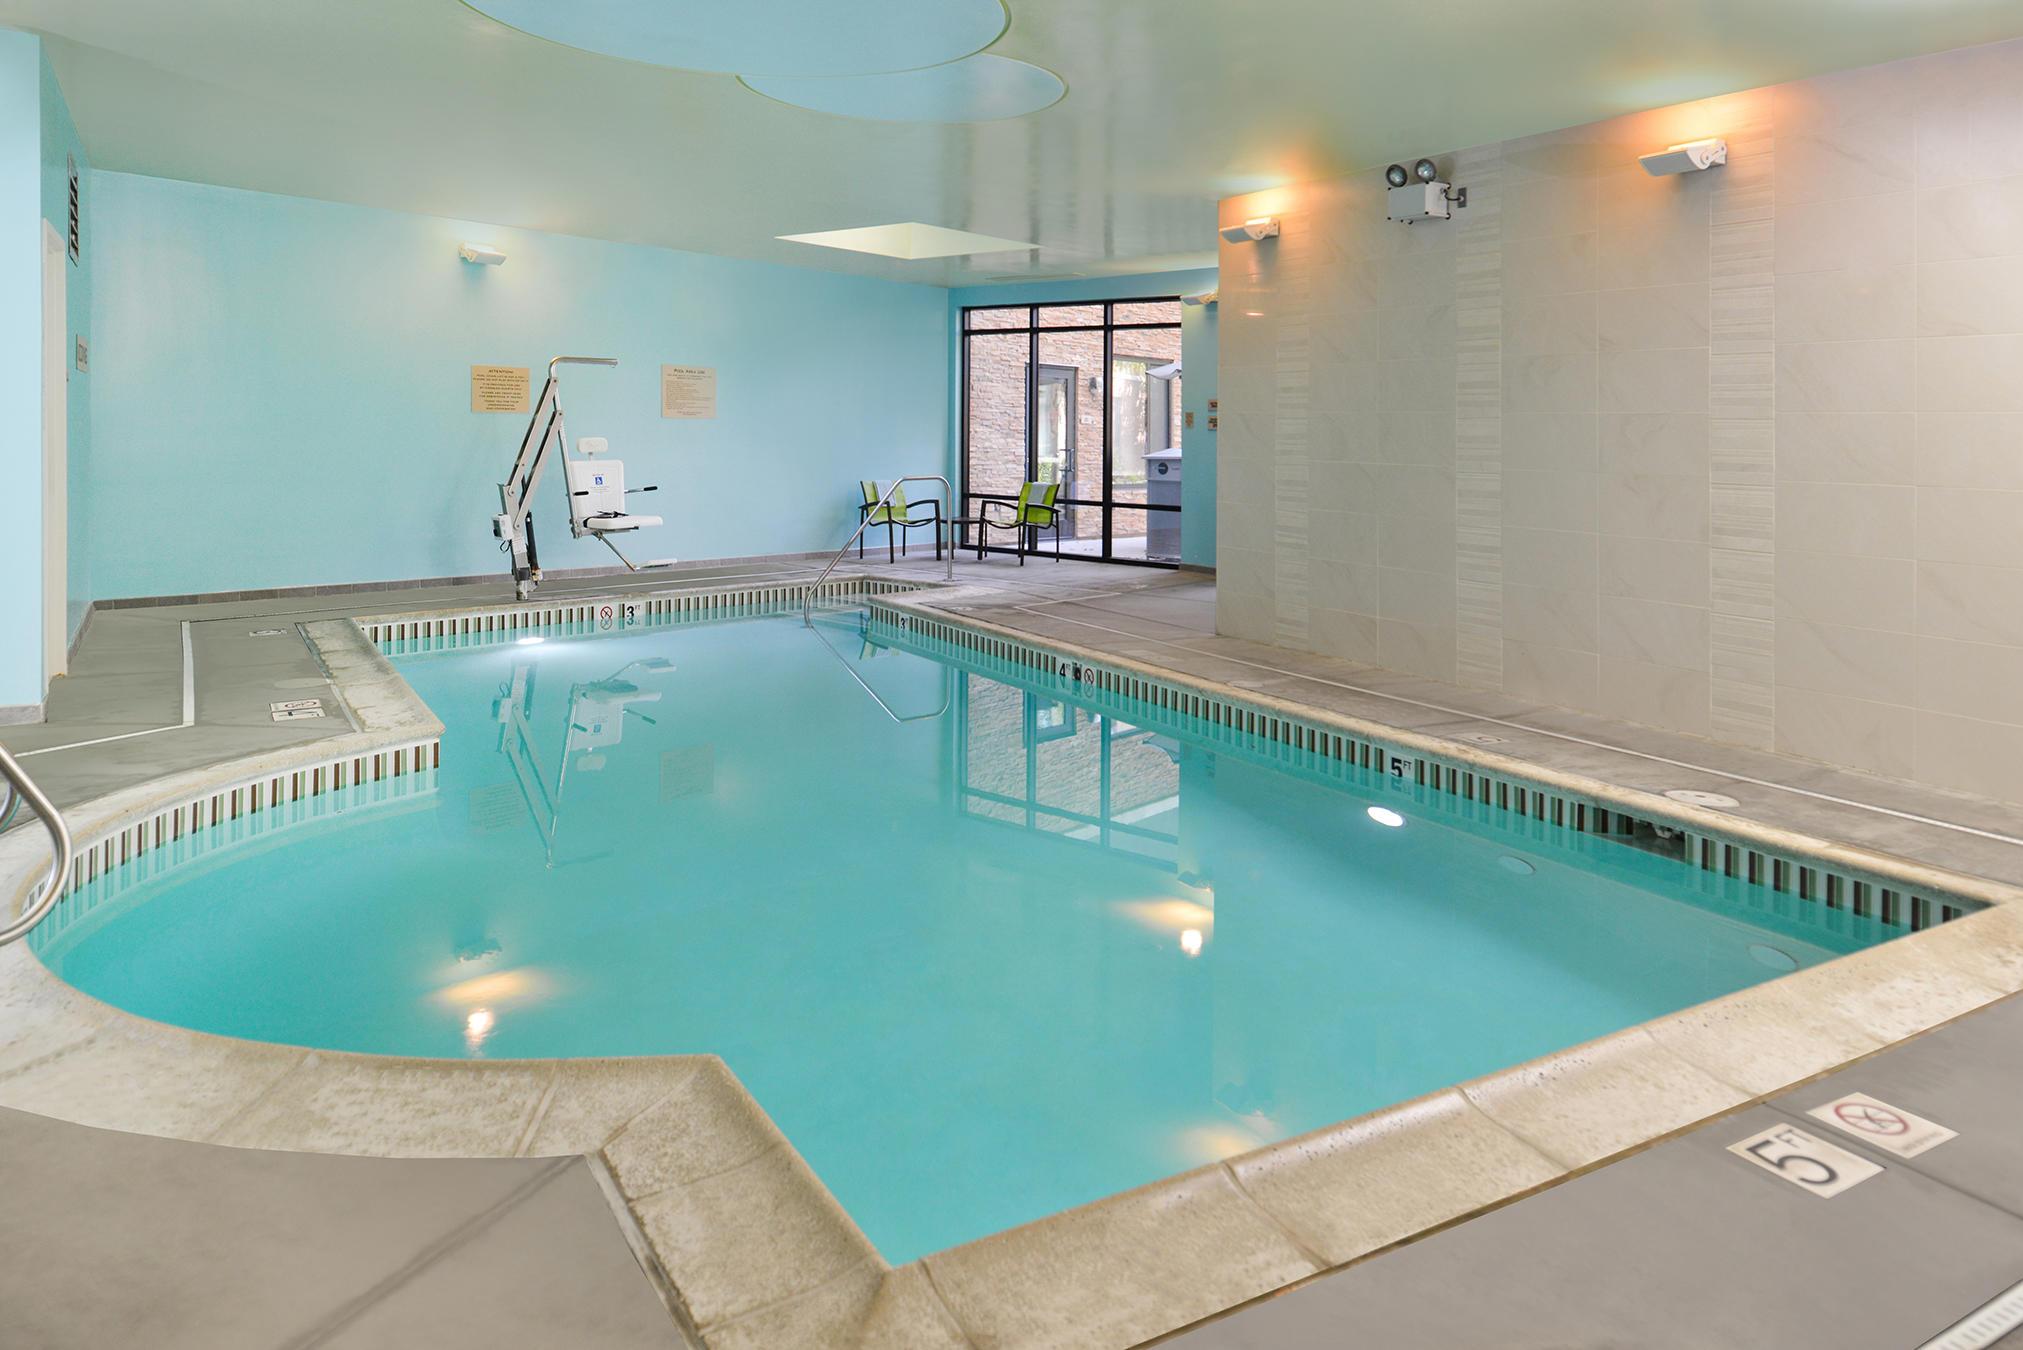 Springhill Suites By Marriott Irvine John Wayne Airport